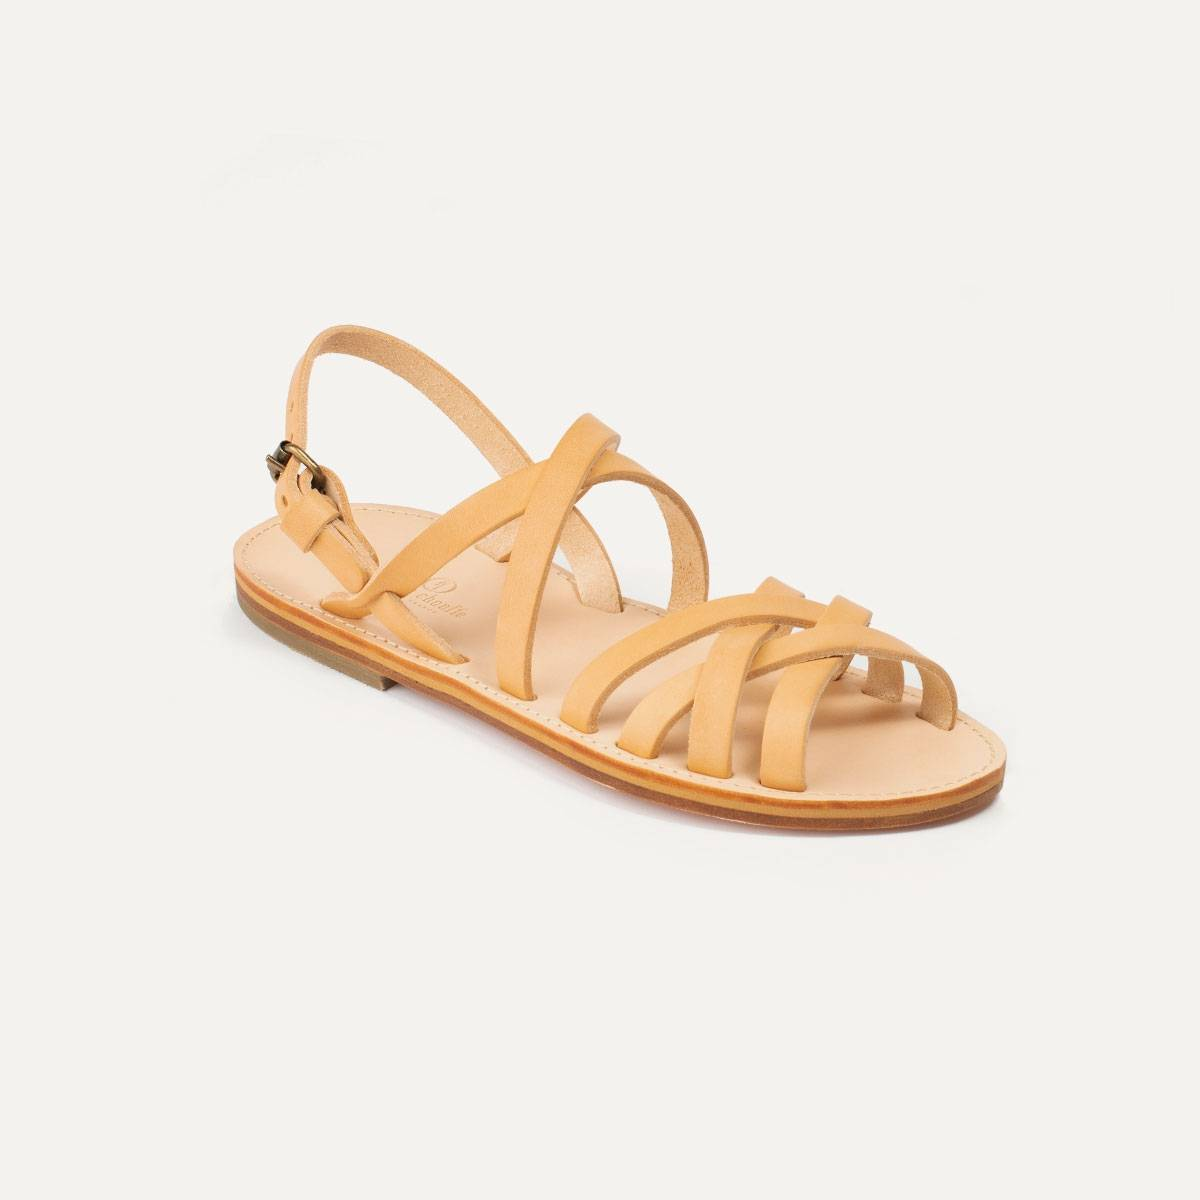 Sandales cuir Majour - Naturel (image n°2)